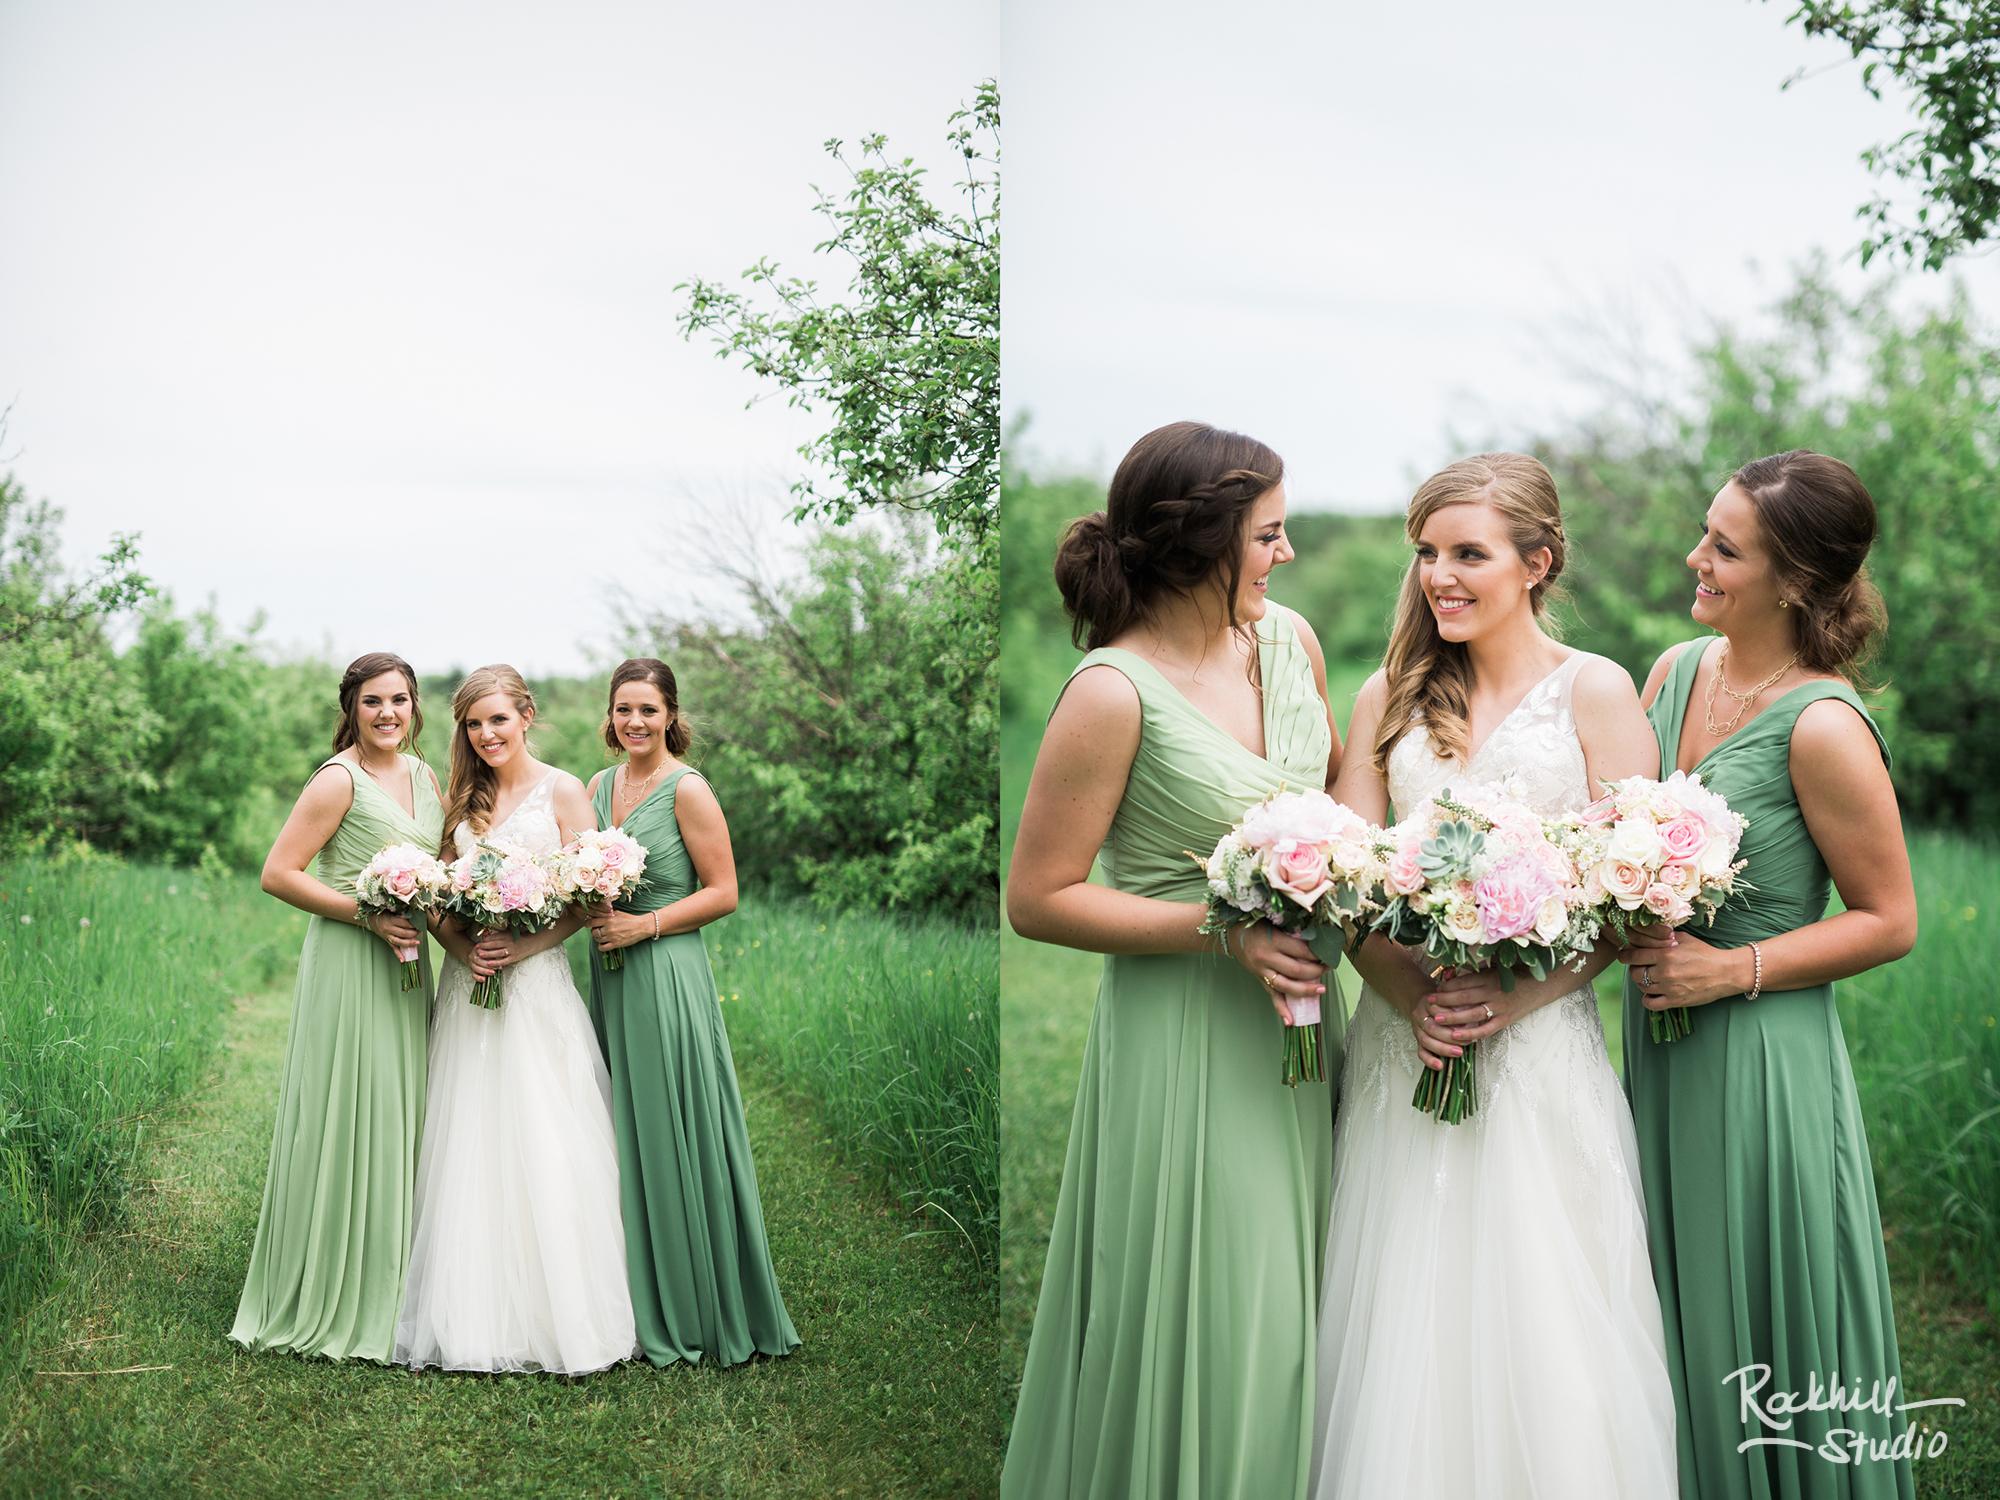 marquette-michigan-wedding-upper-peninsula-spring-photography-rockhill-ee-35.jpg